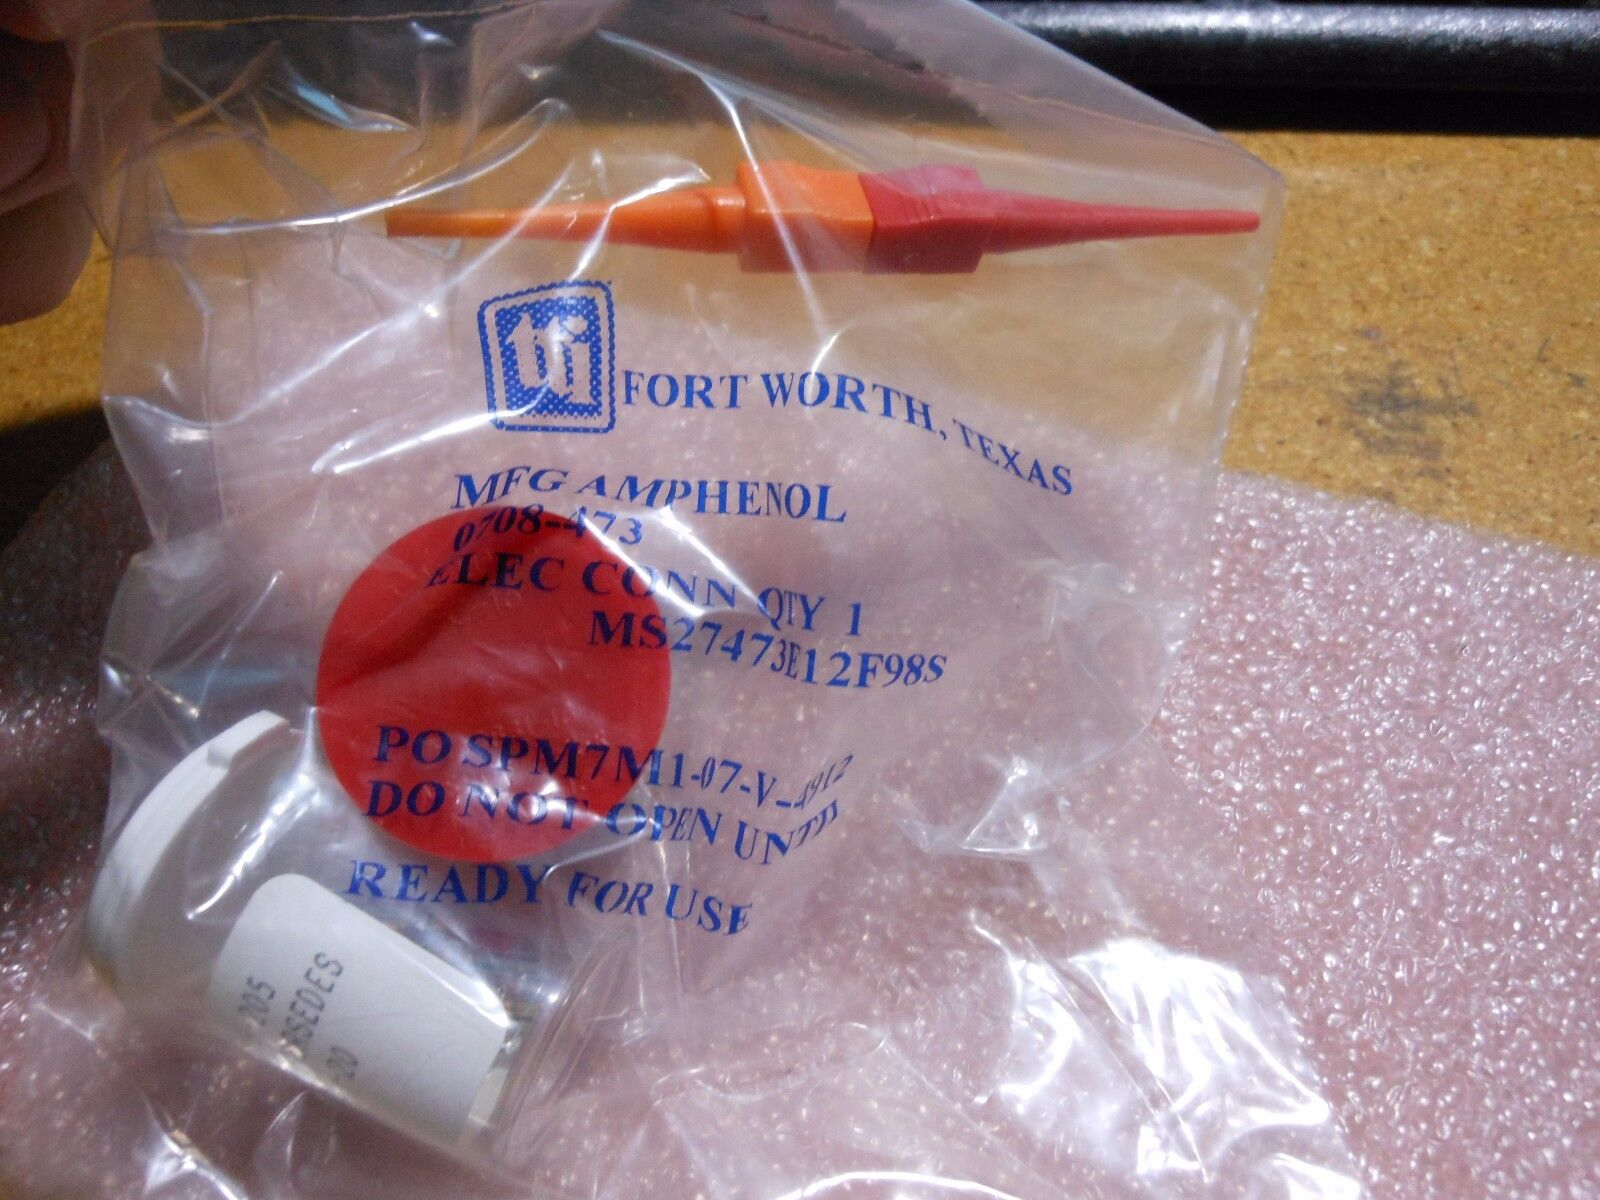 Amphenol Part Number MS27499E12B98P